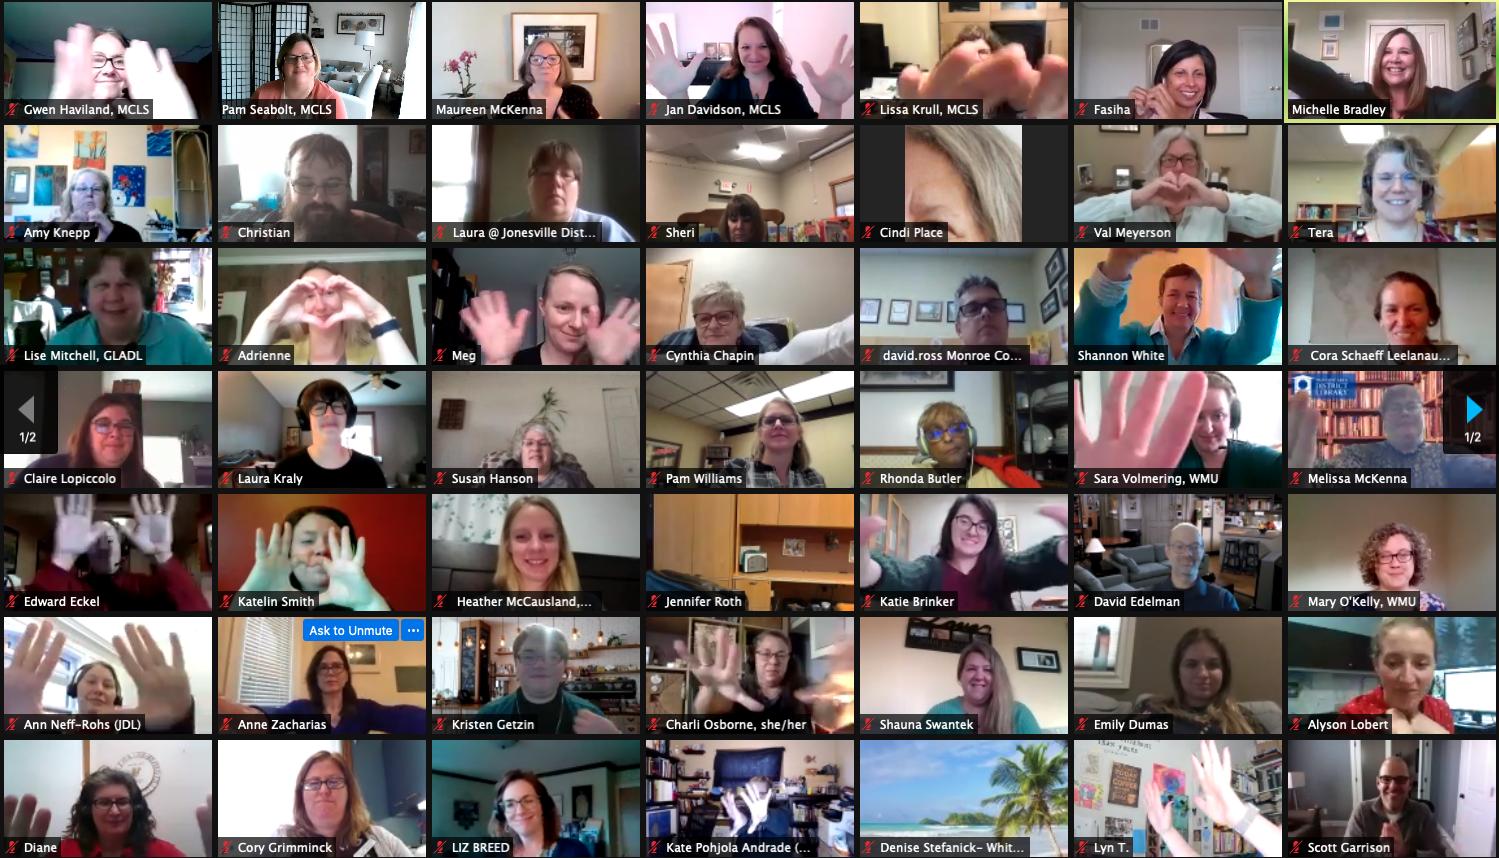 Screen Shot 2020-11-05 at 4.08.00 hands up PM (2).png